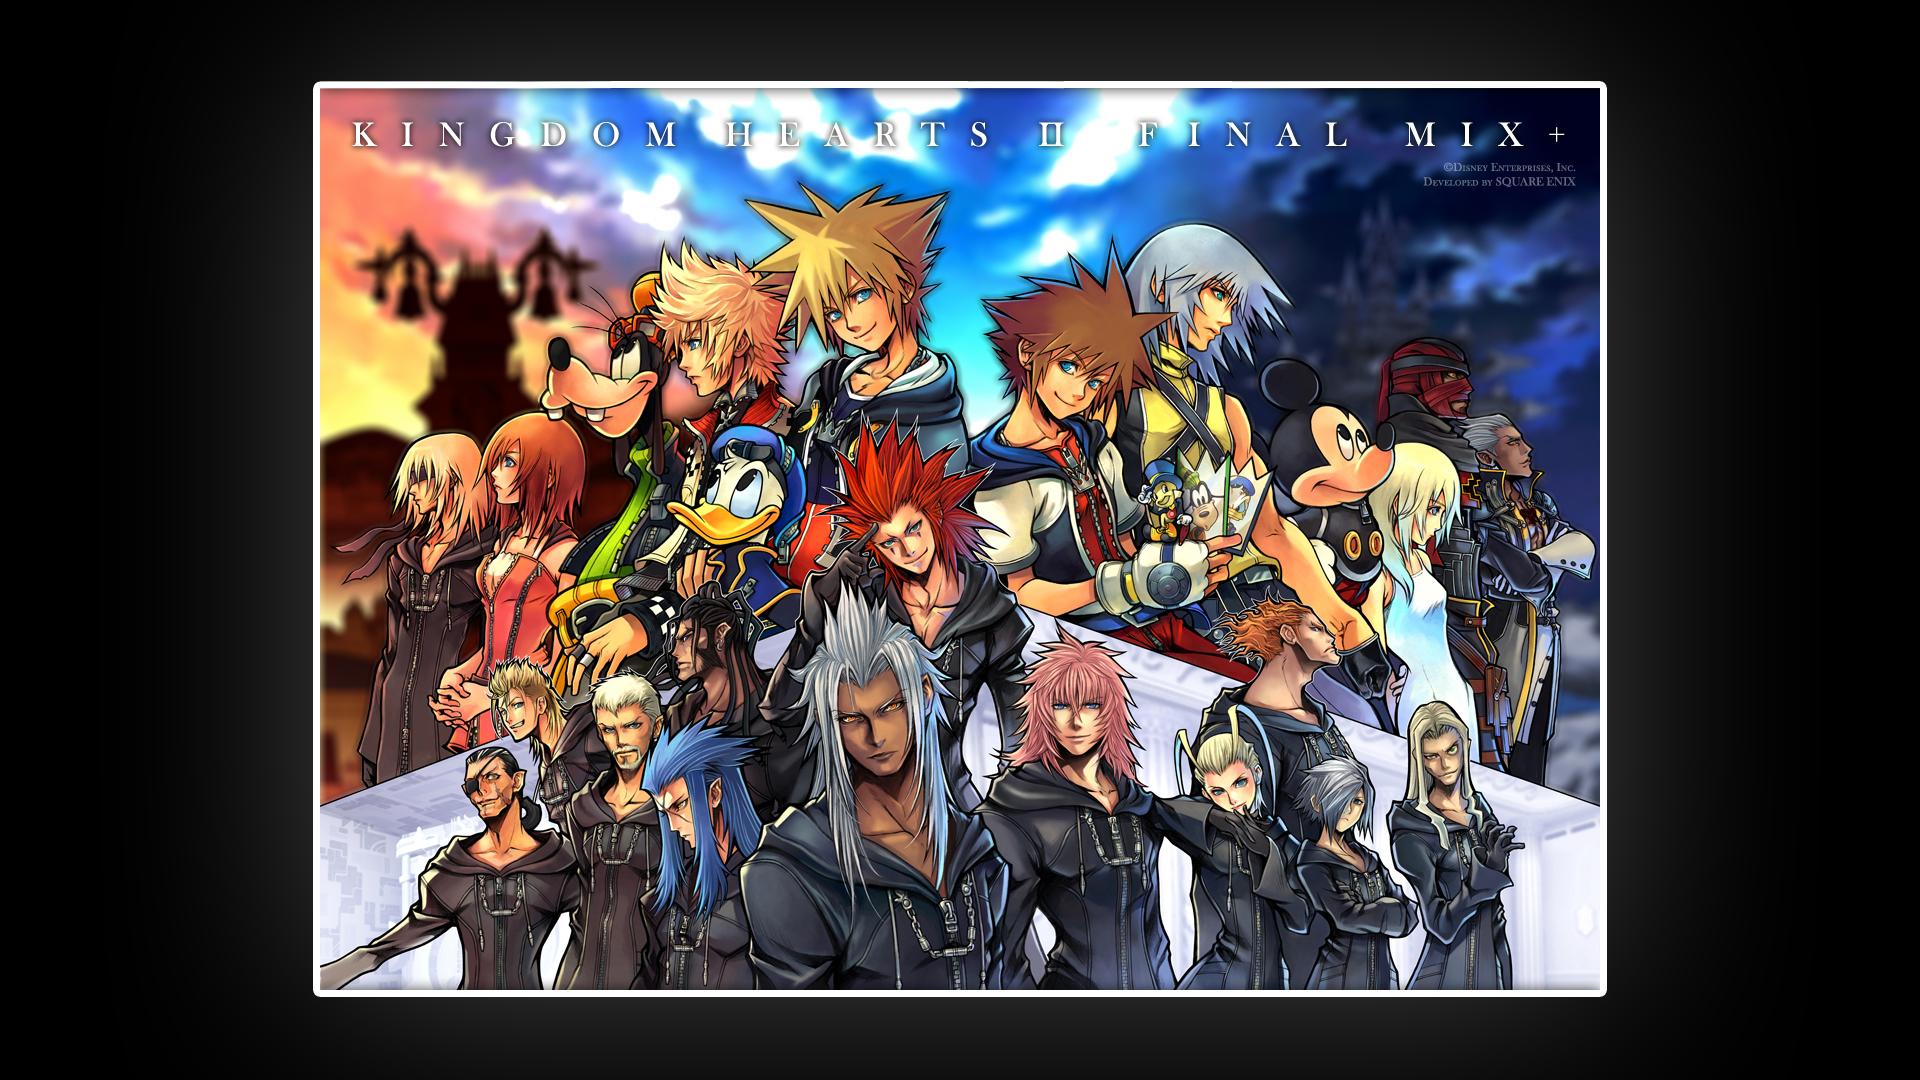 Animal Crossing Desktop Wallpaper Download Kingdom Hearts Hd Wallpapers Pixelstalk Net